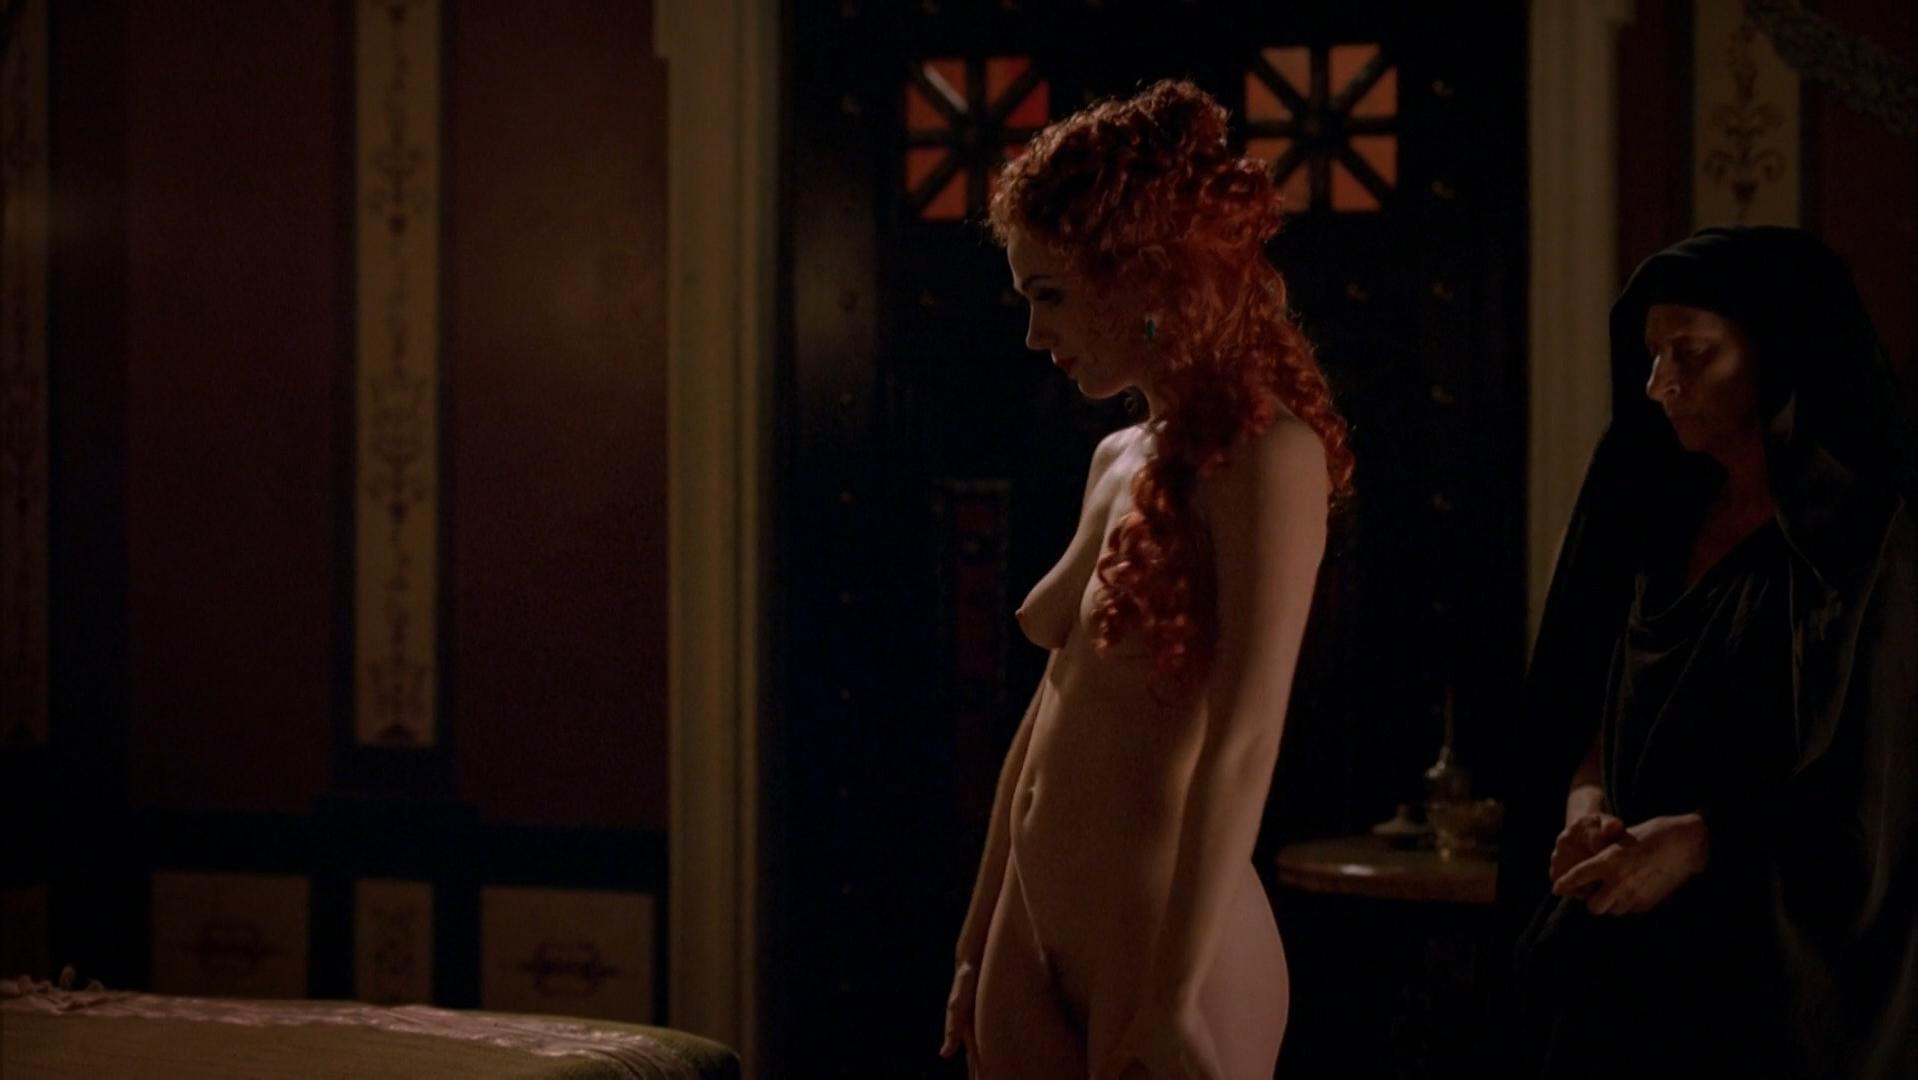 Vidéos Porno de Polly Walker Rome Sex Scenes  frpornhubcom